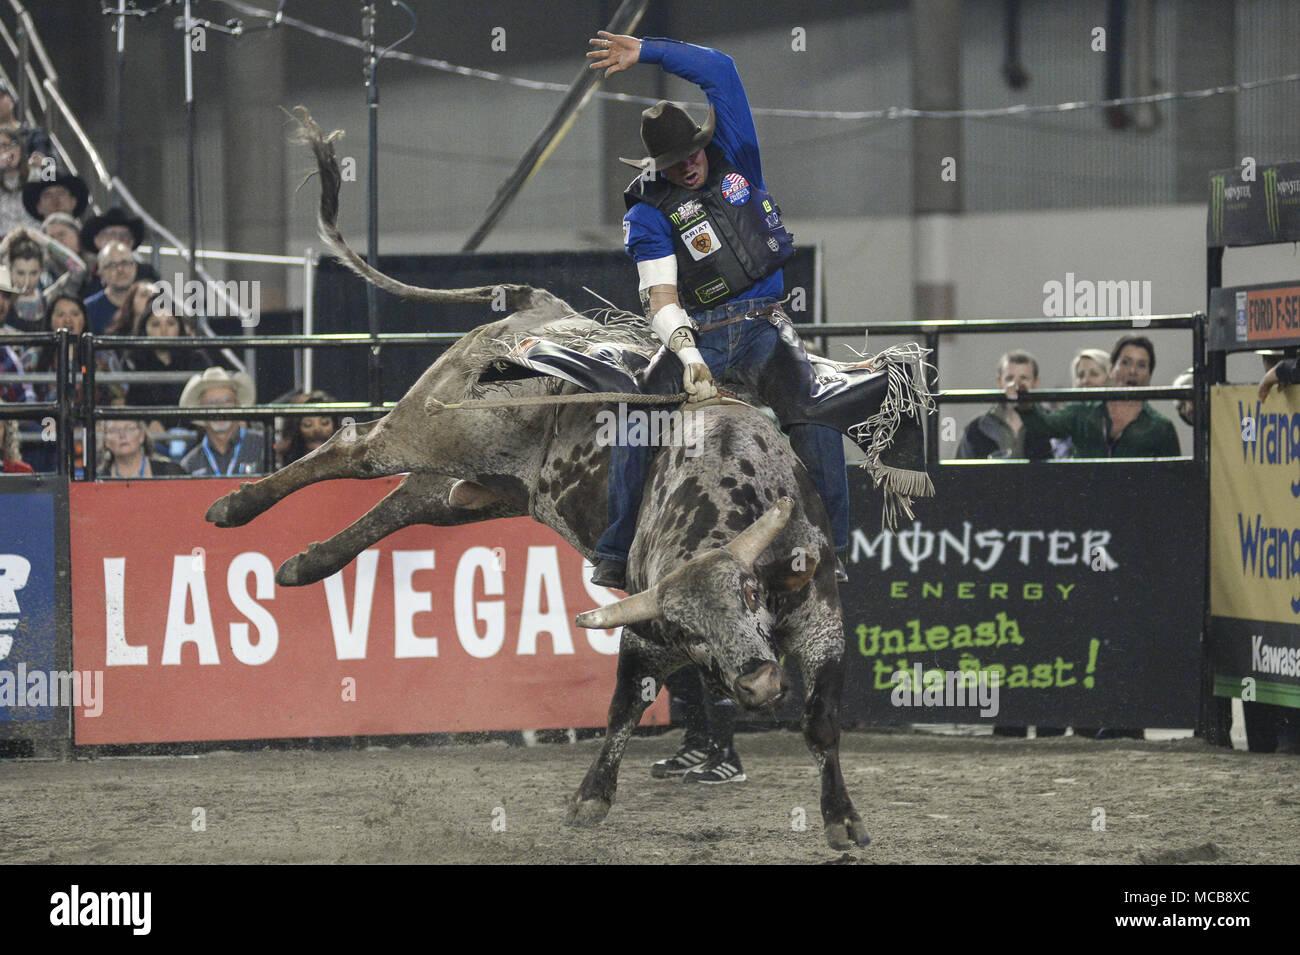 Tacoma, Washington, USA. 14th Apr, 2018. Professional bull rider ...